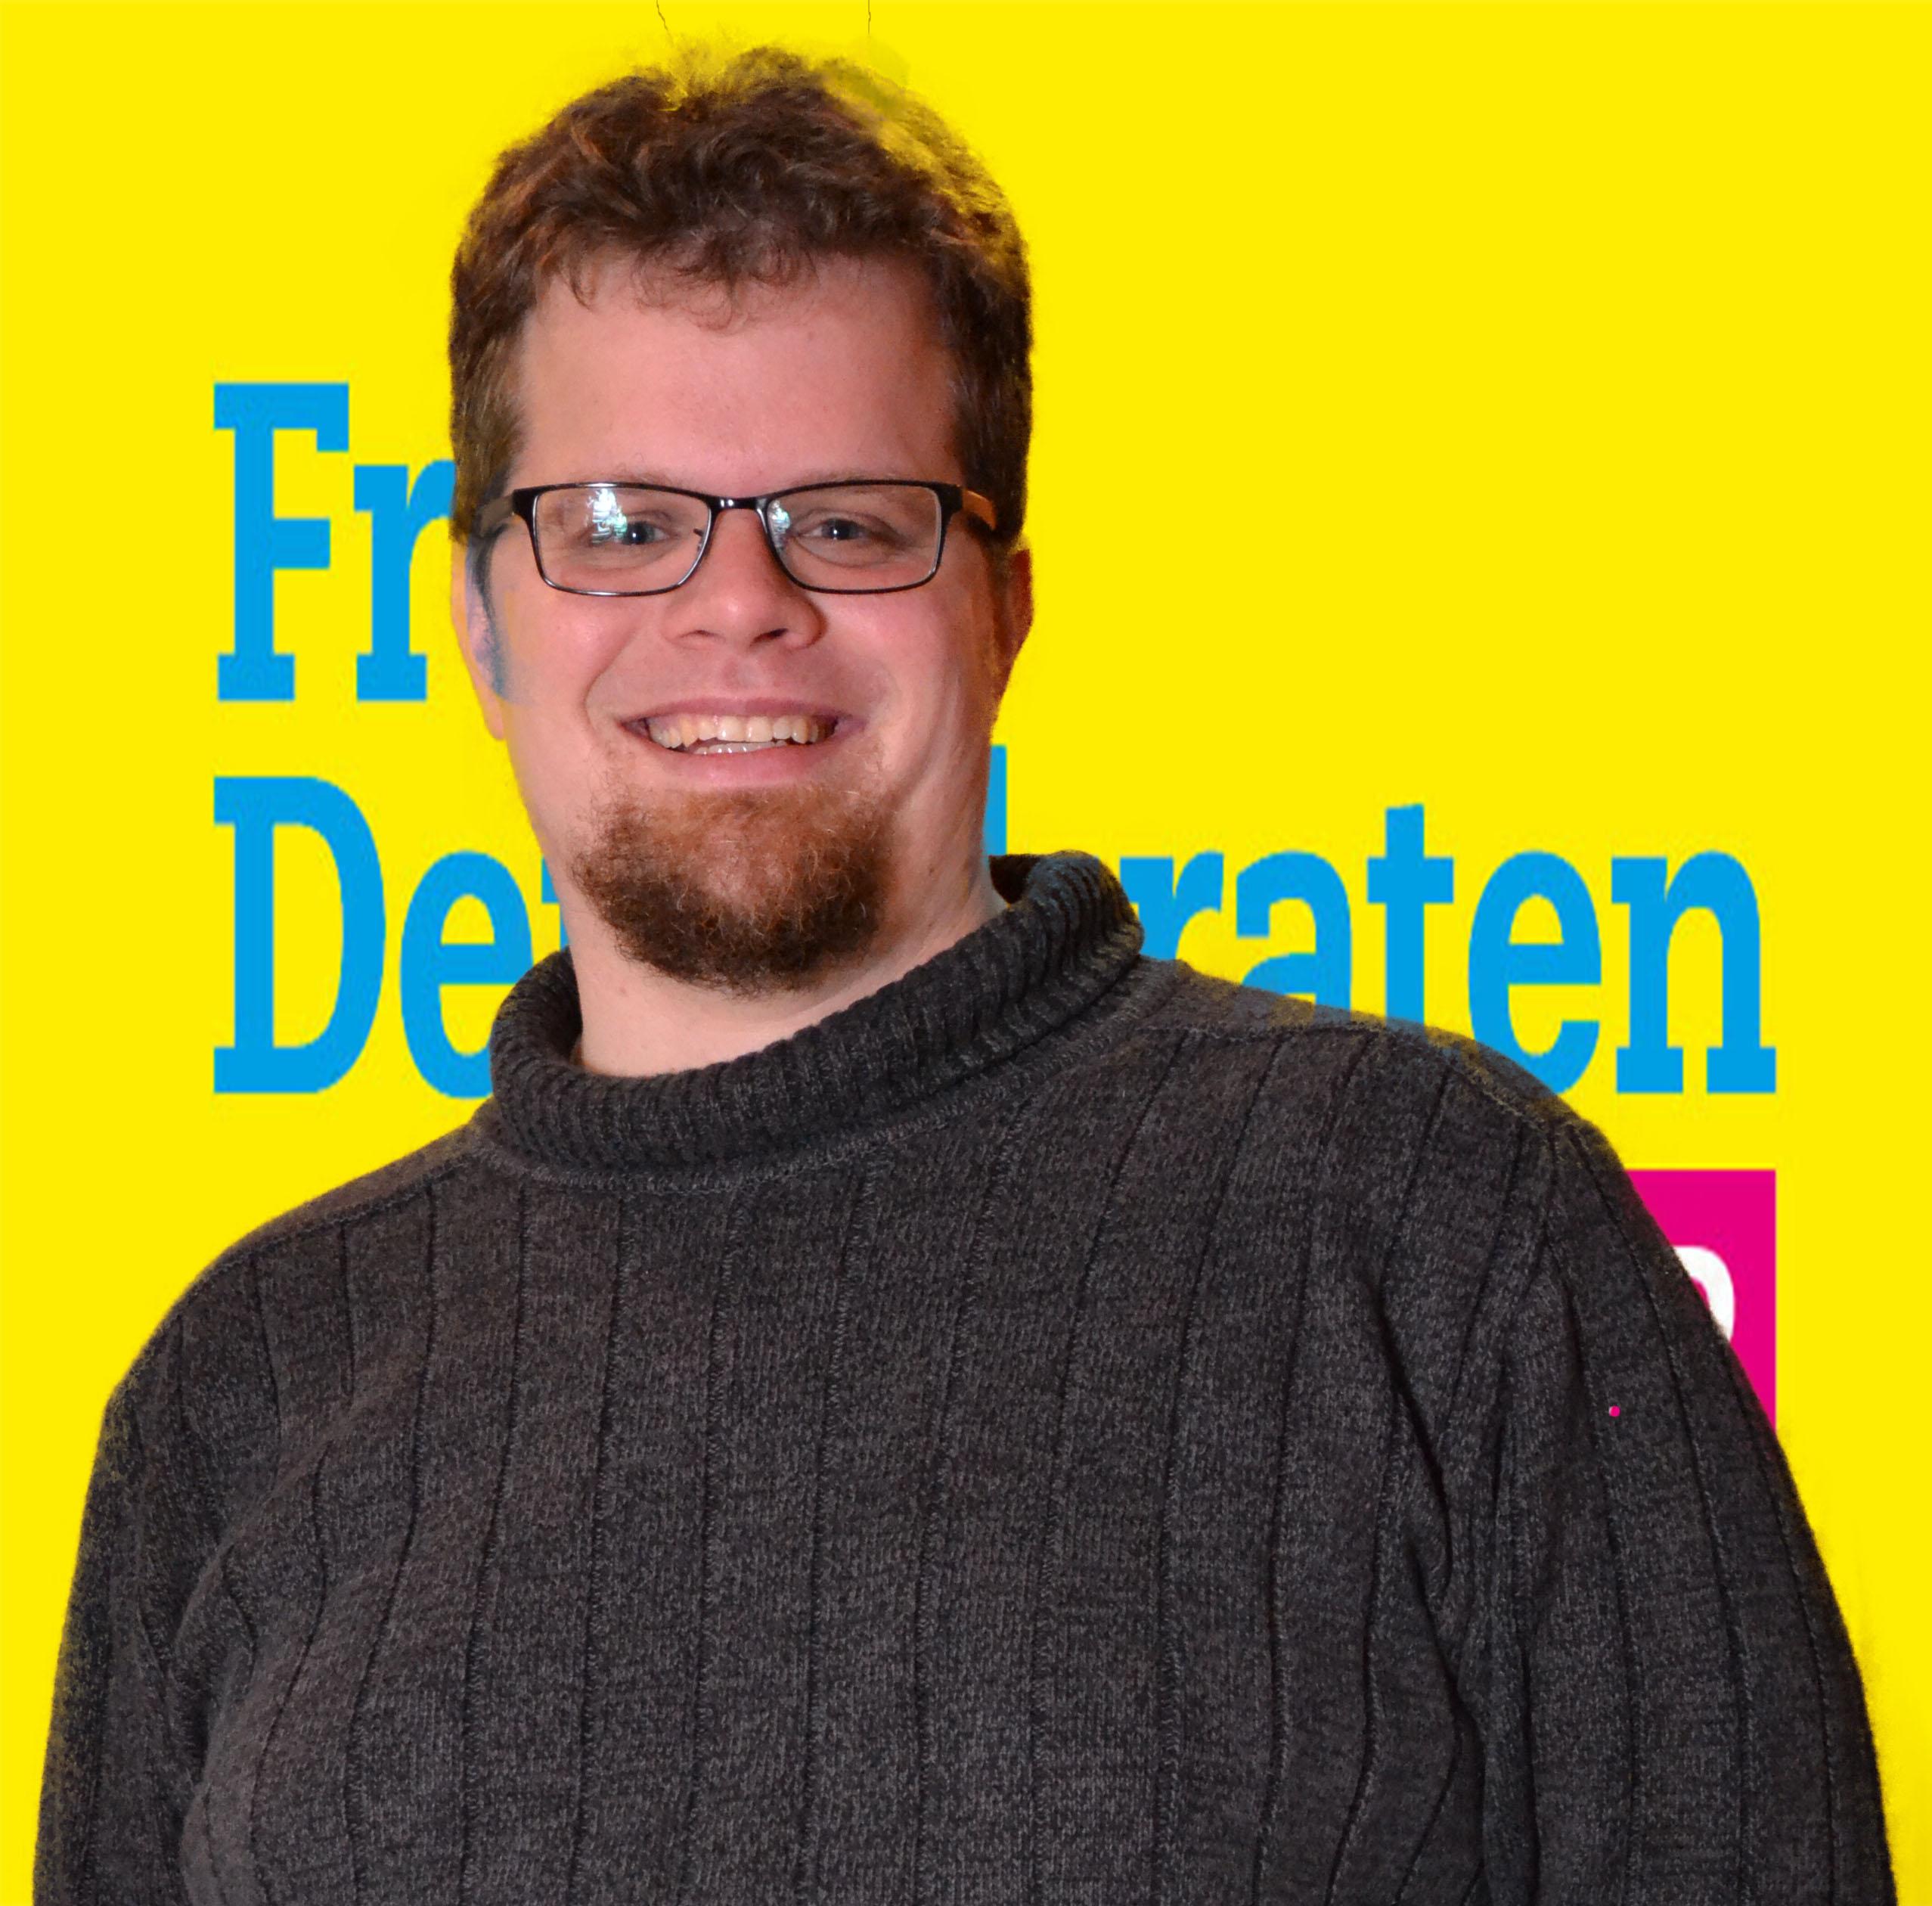 Martin Lüstraten